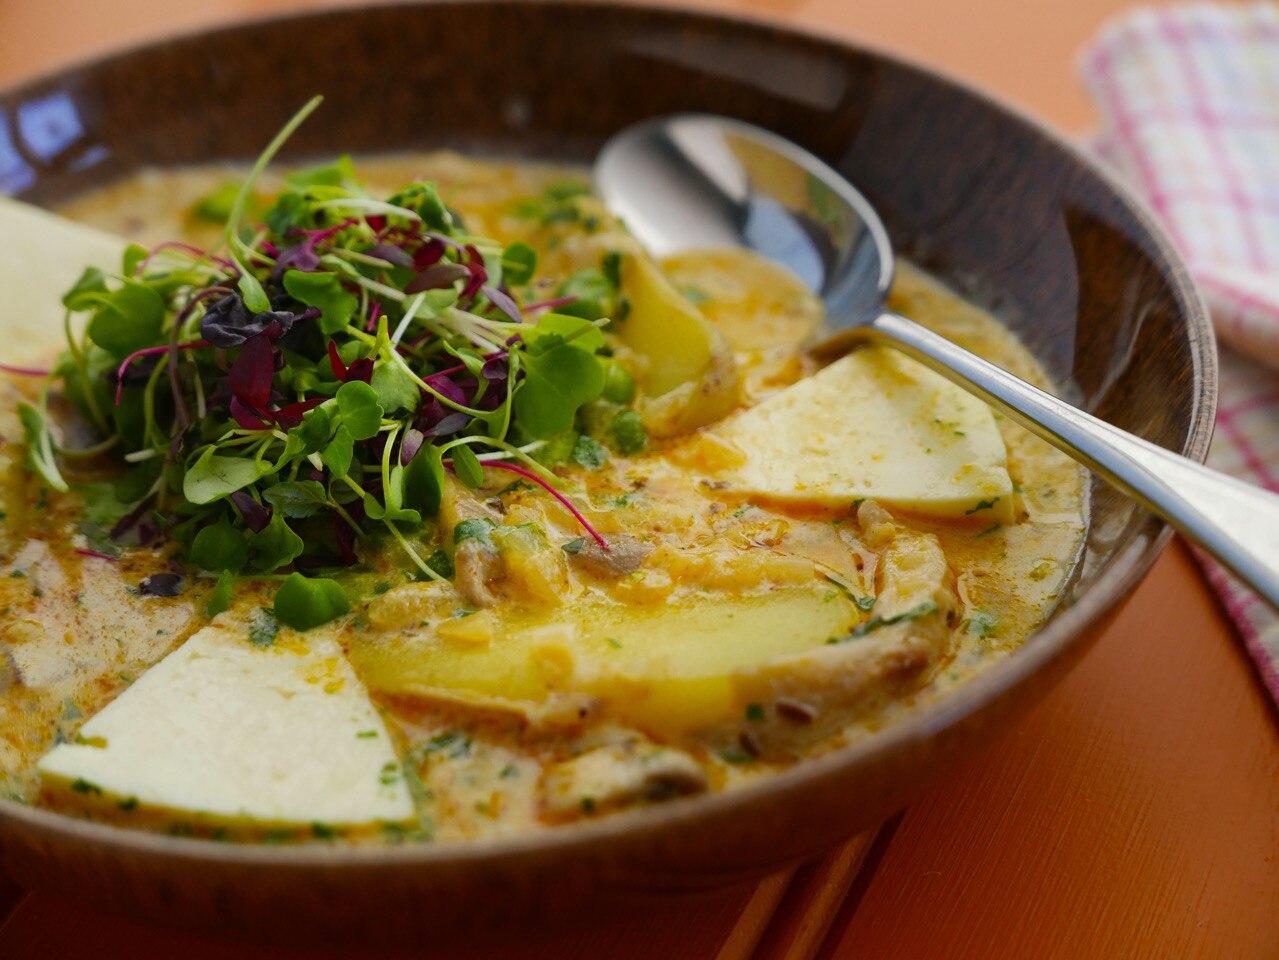 Kapchi de Setas - Peruvian Mushroom and Broad Bean Soup